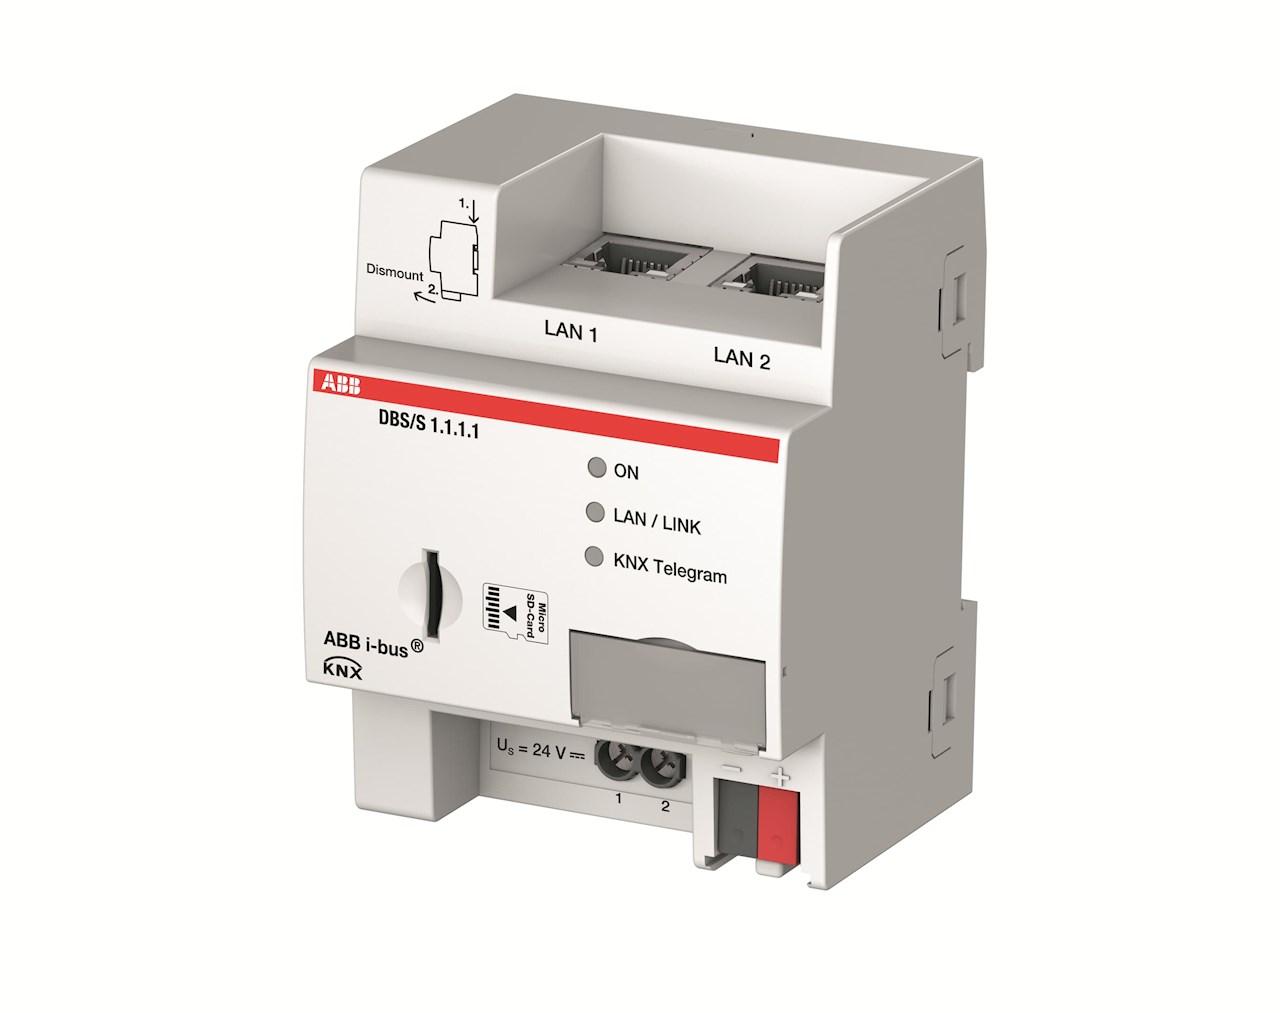 ABB i-bus® KNX IoT Dashboard.